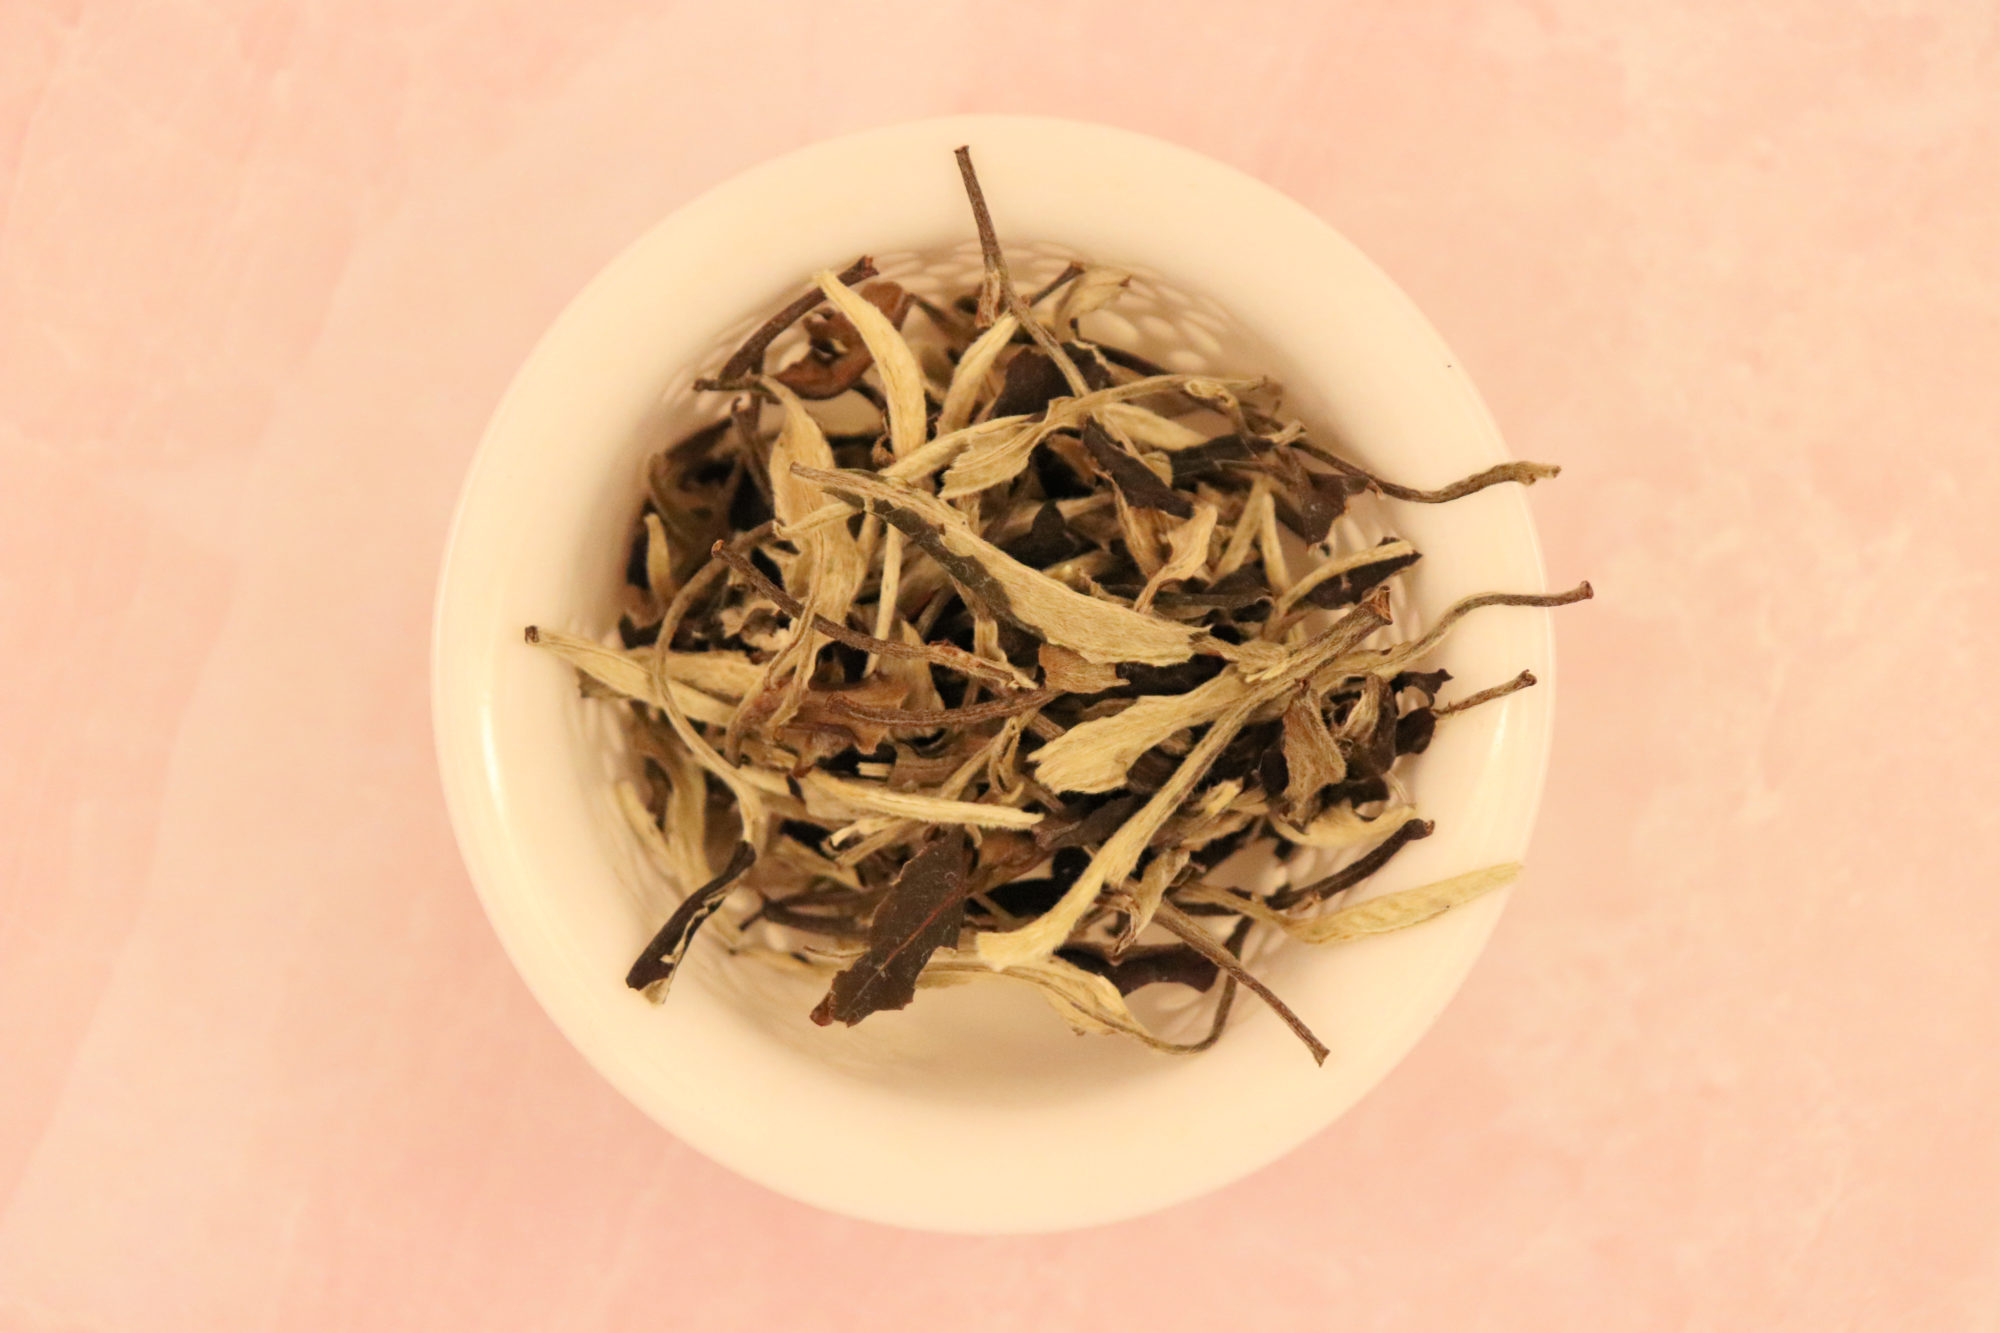 Moonlight White Tea leaves in a gaiwan